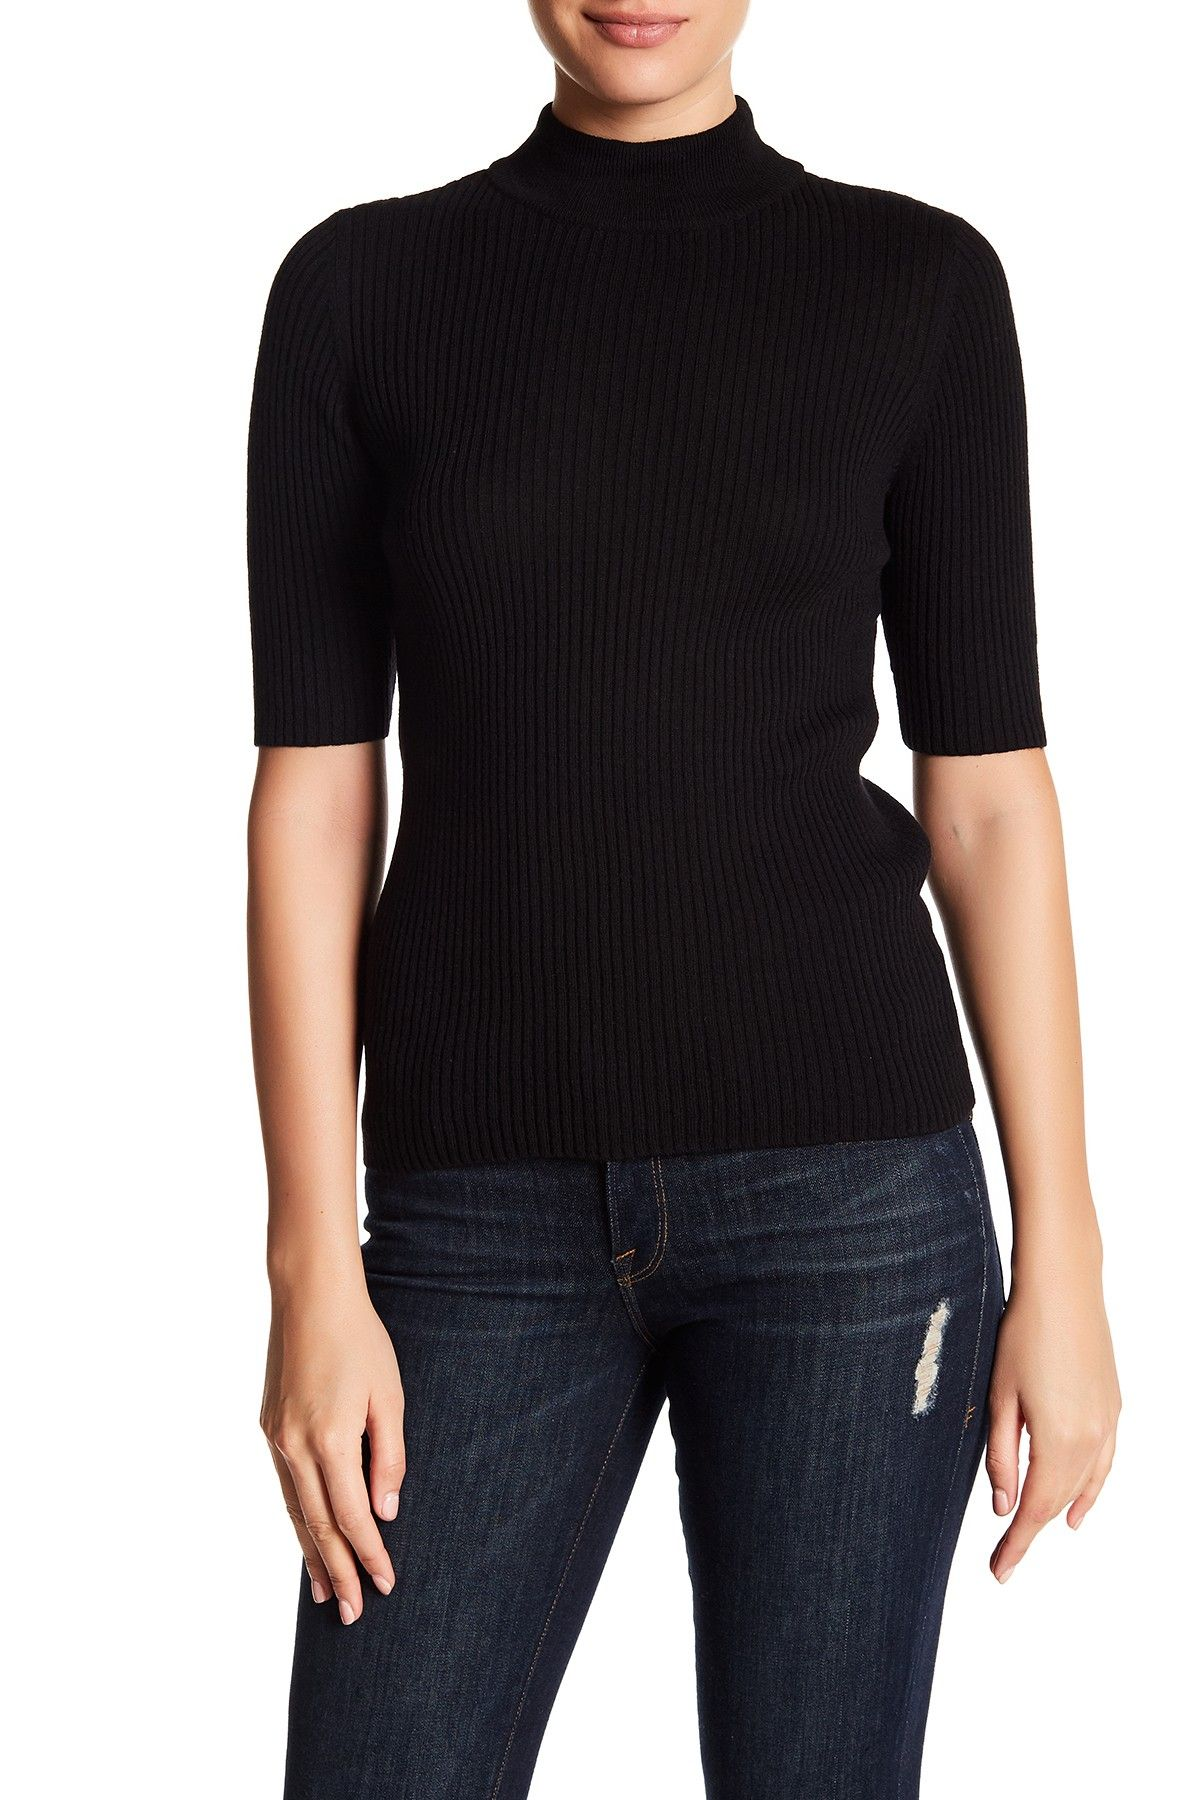 Short Sleeve Mock Neck Sweater Products Pinterest Short